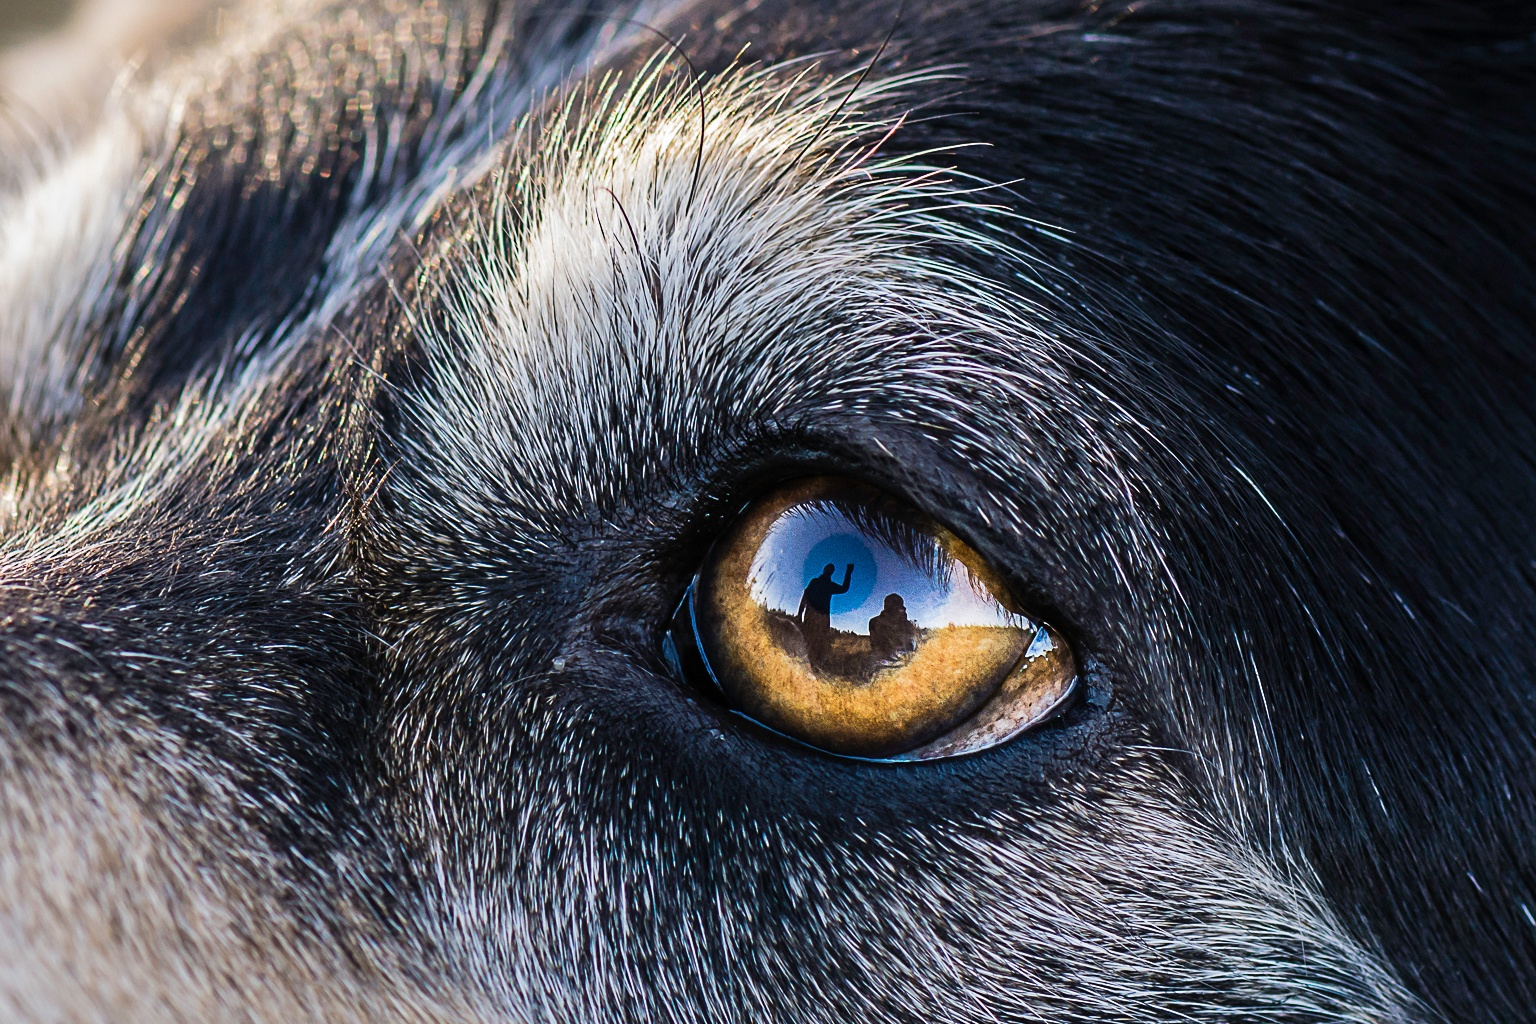 Eye contact by mossienet